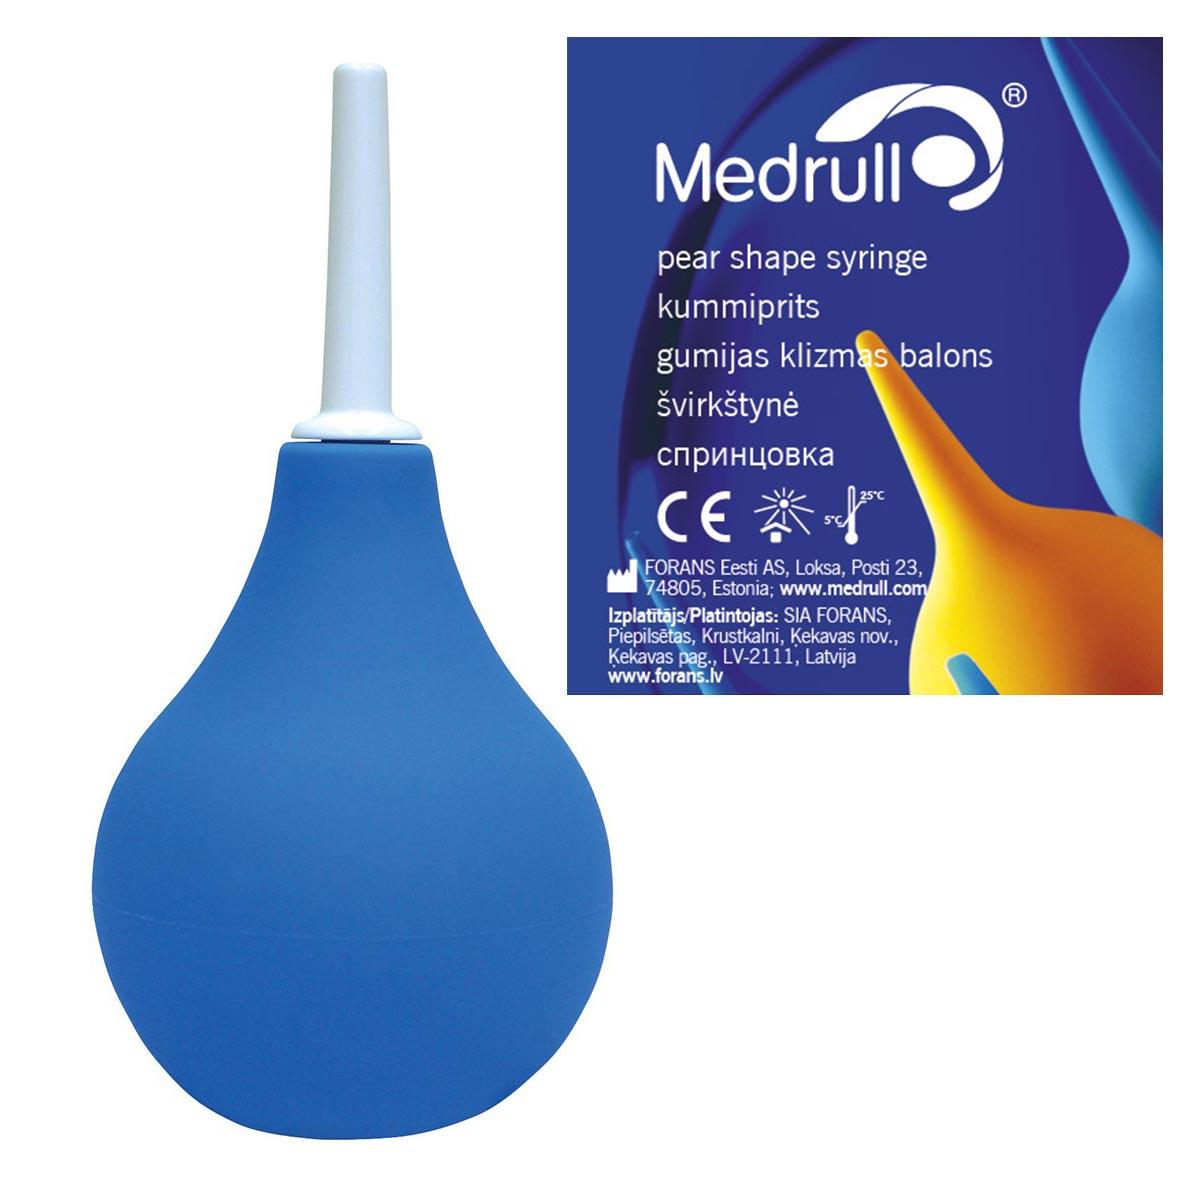 Medrull Cпринцовка для медицинских процедур, тип Б-1, 30 мл Medrull